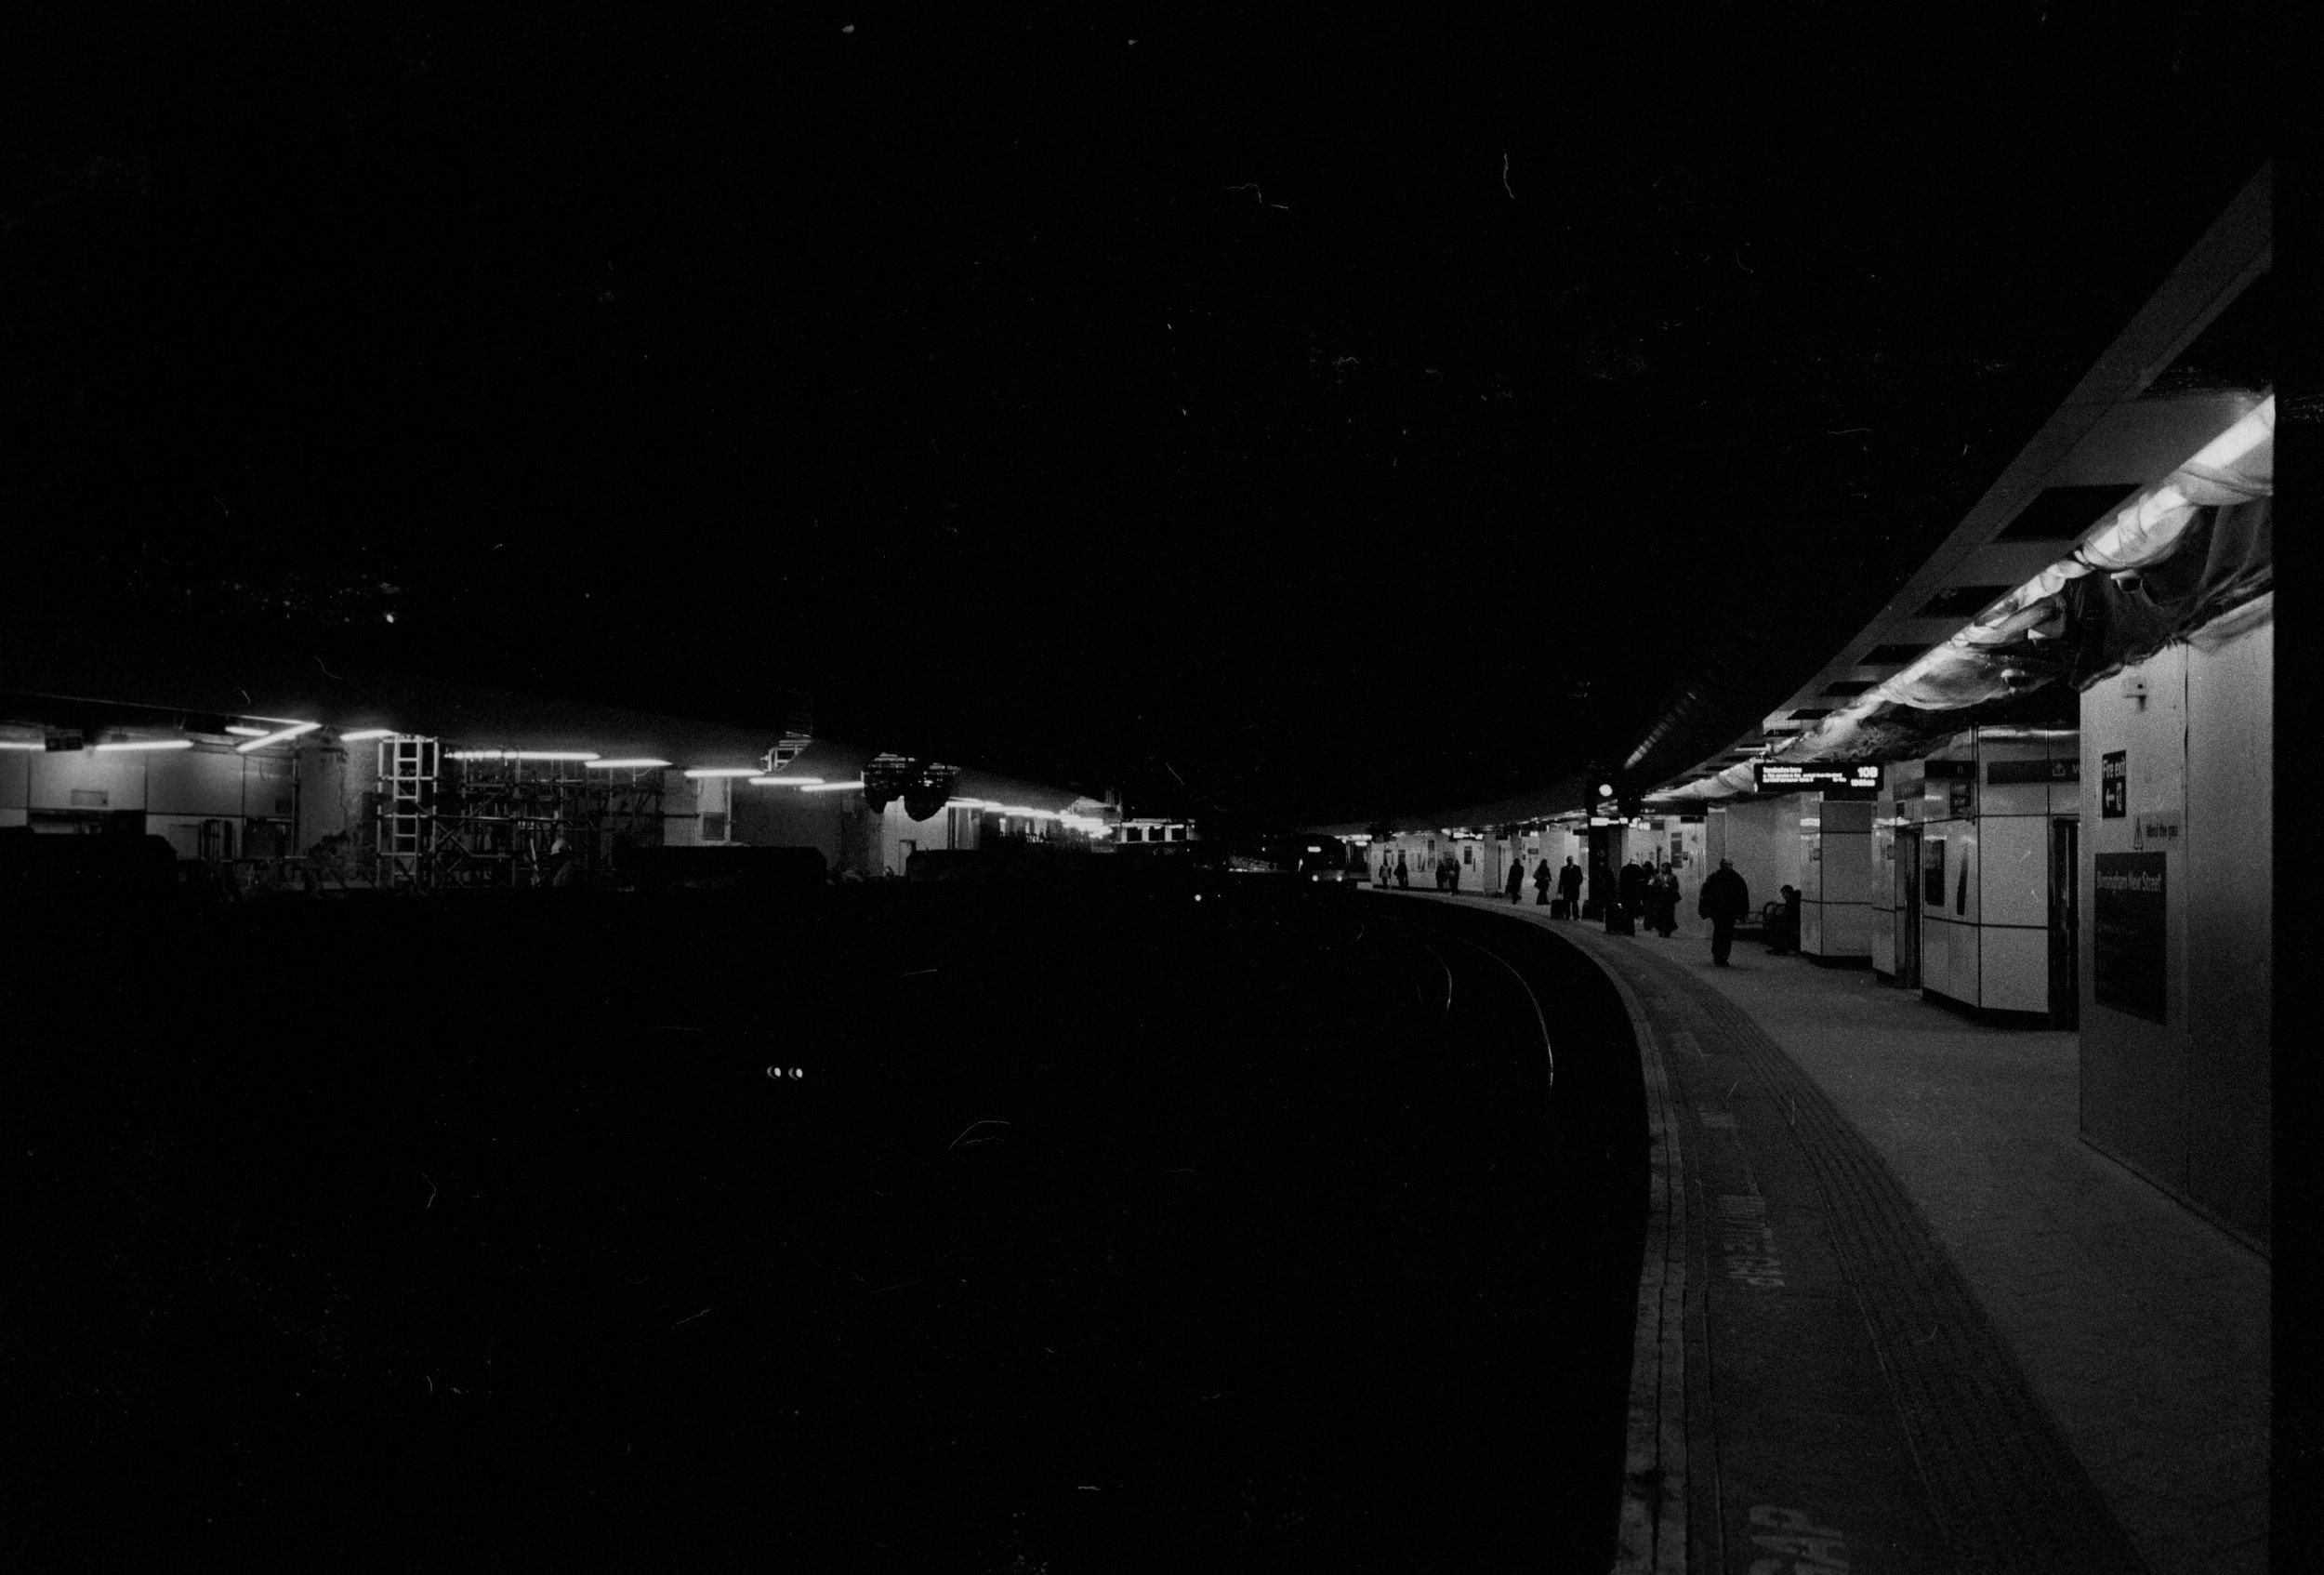 Liverpool - Docks batch0004.jpg